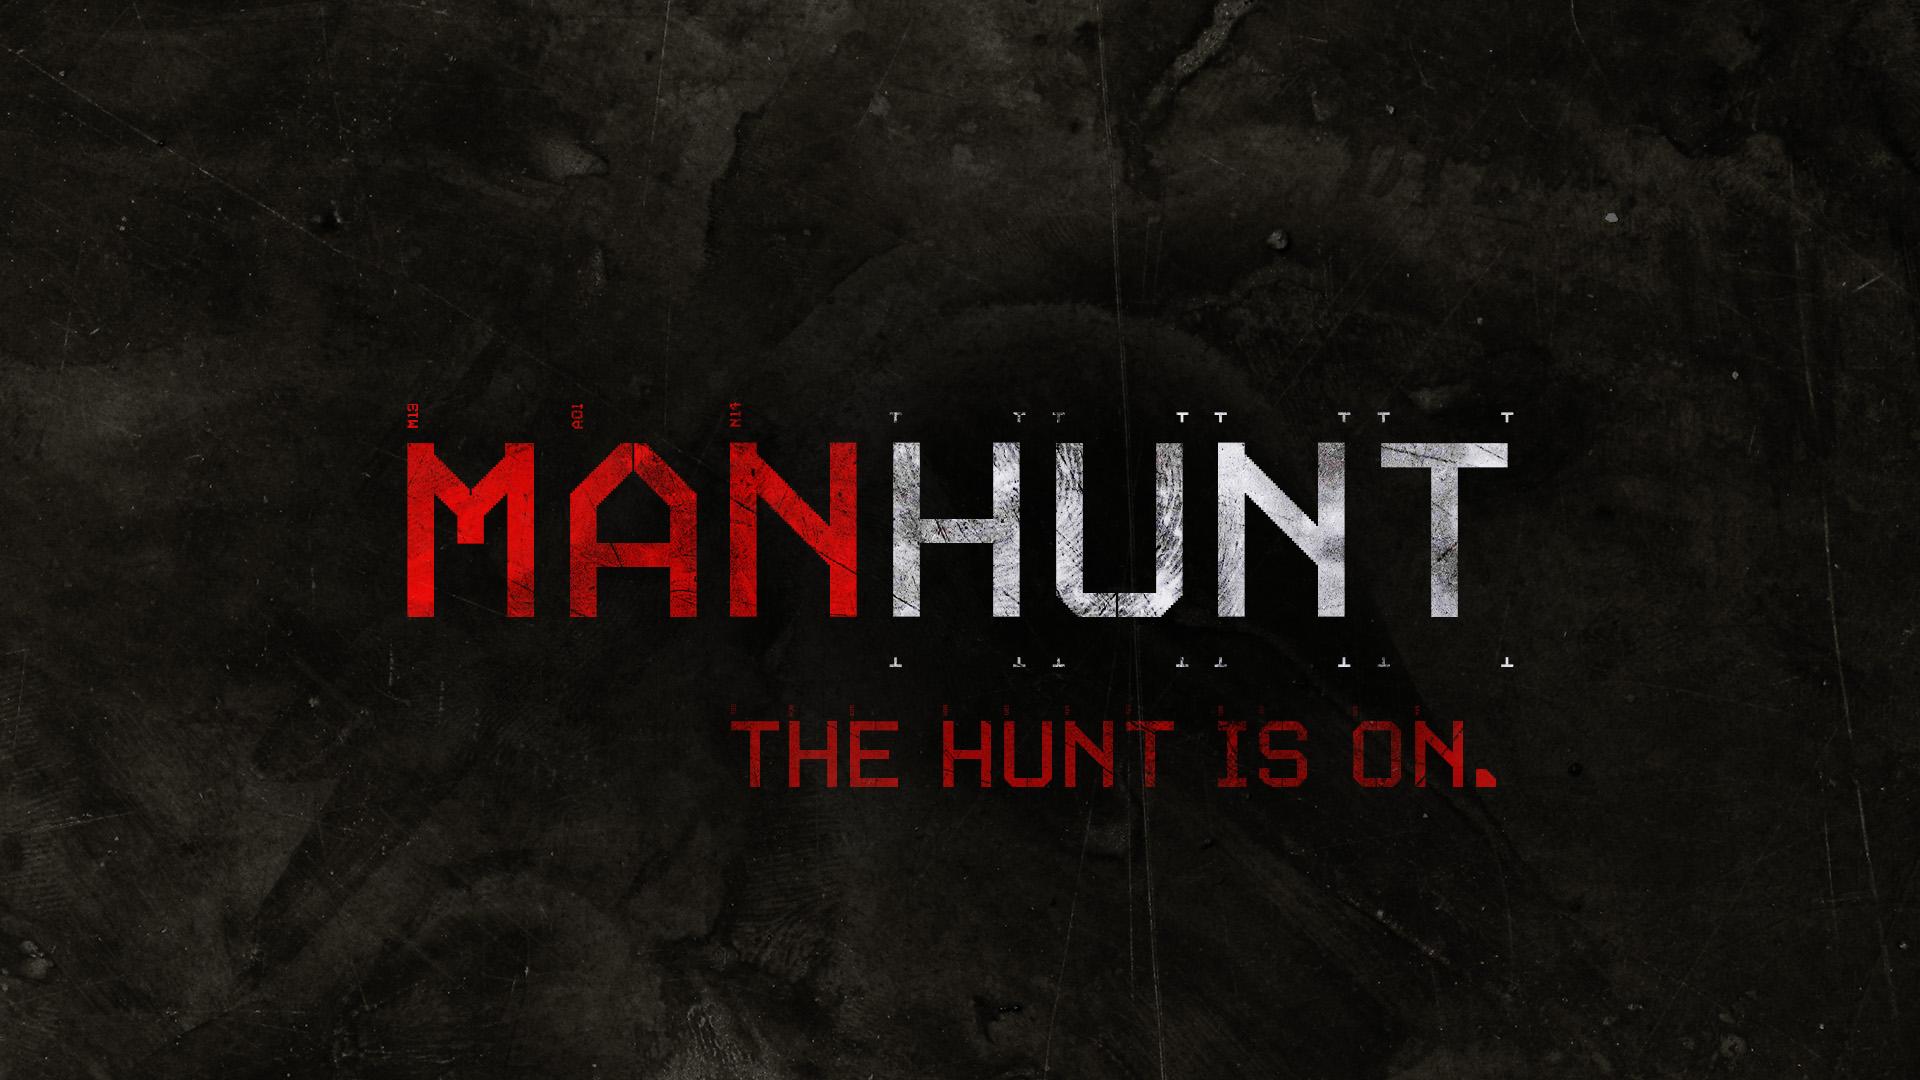 xManhunt_V2_5.jpg